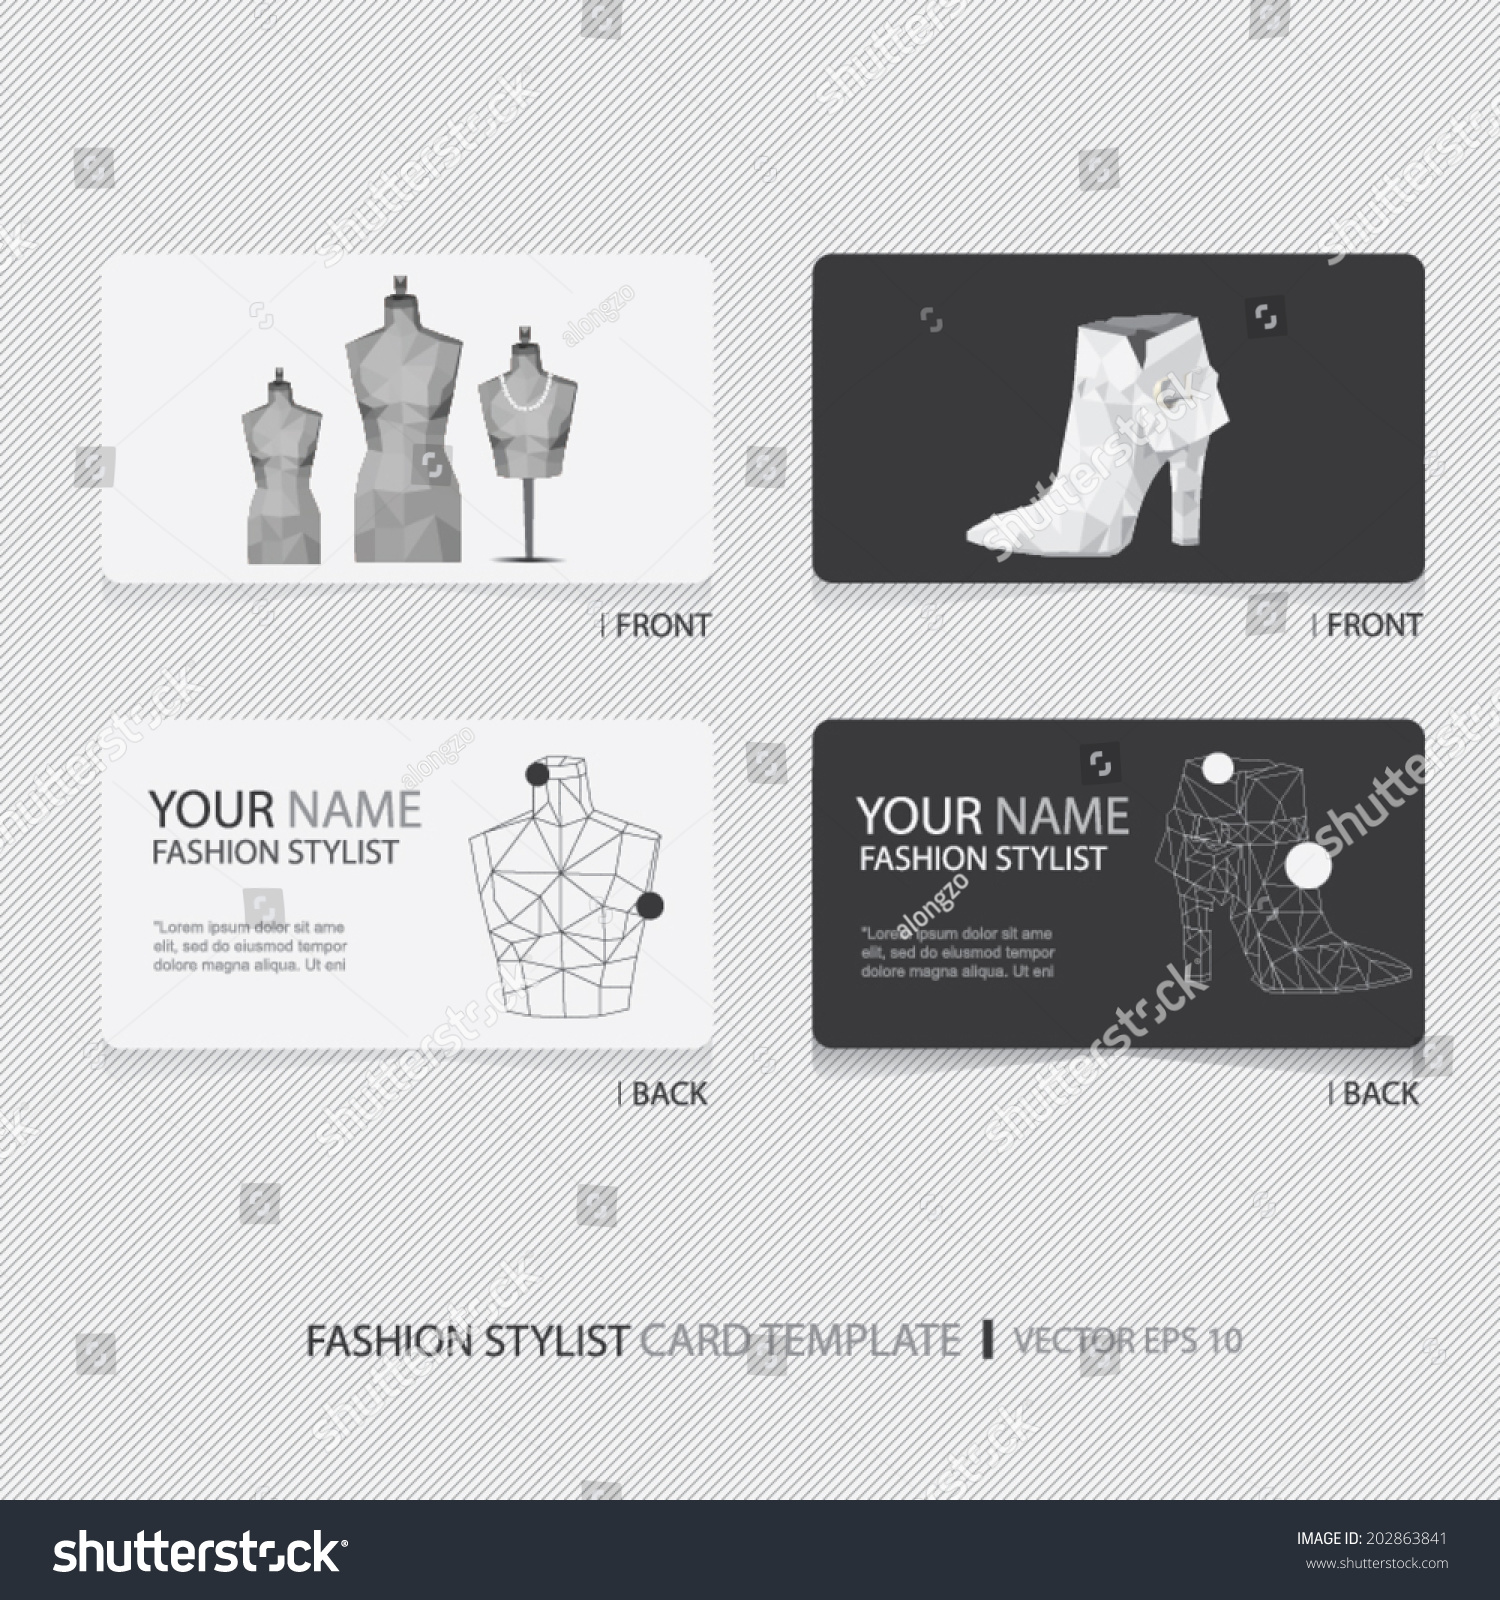 fashion stylist designer business card set - Fashion Designer Business Card